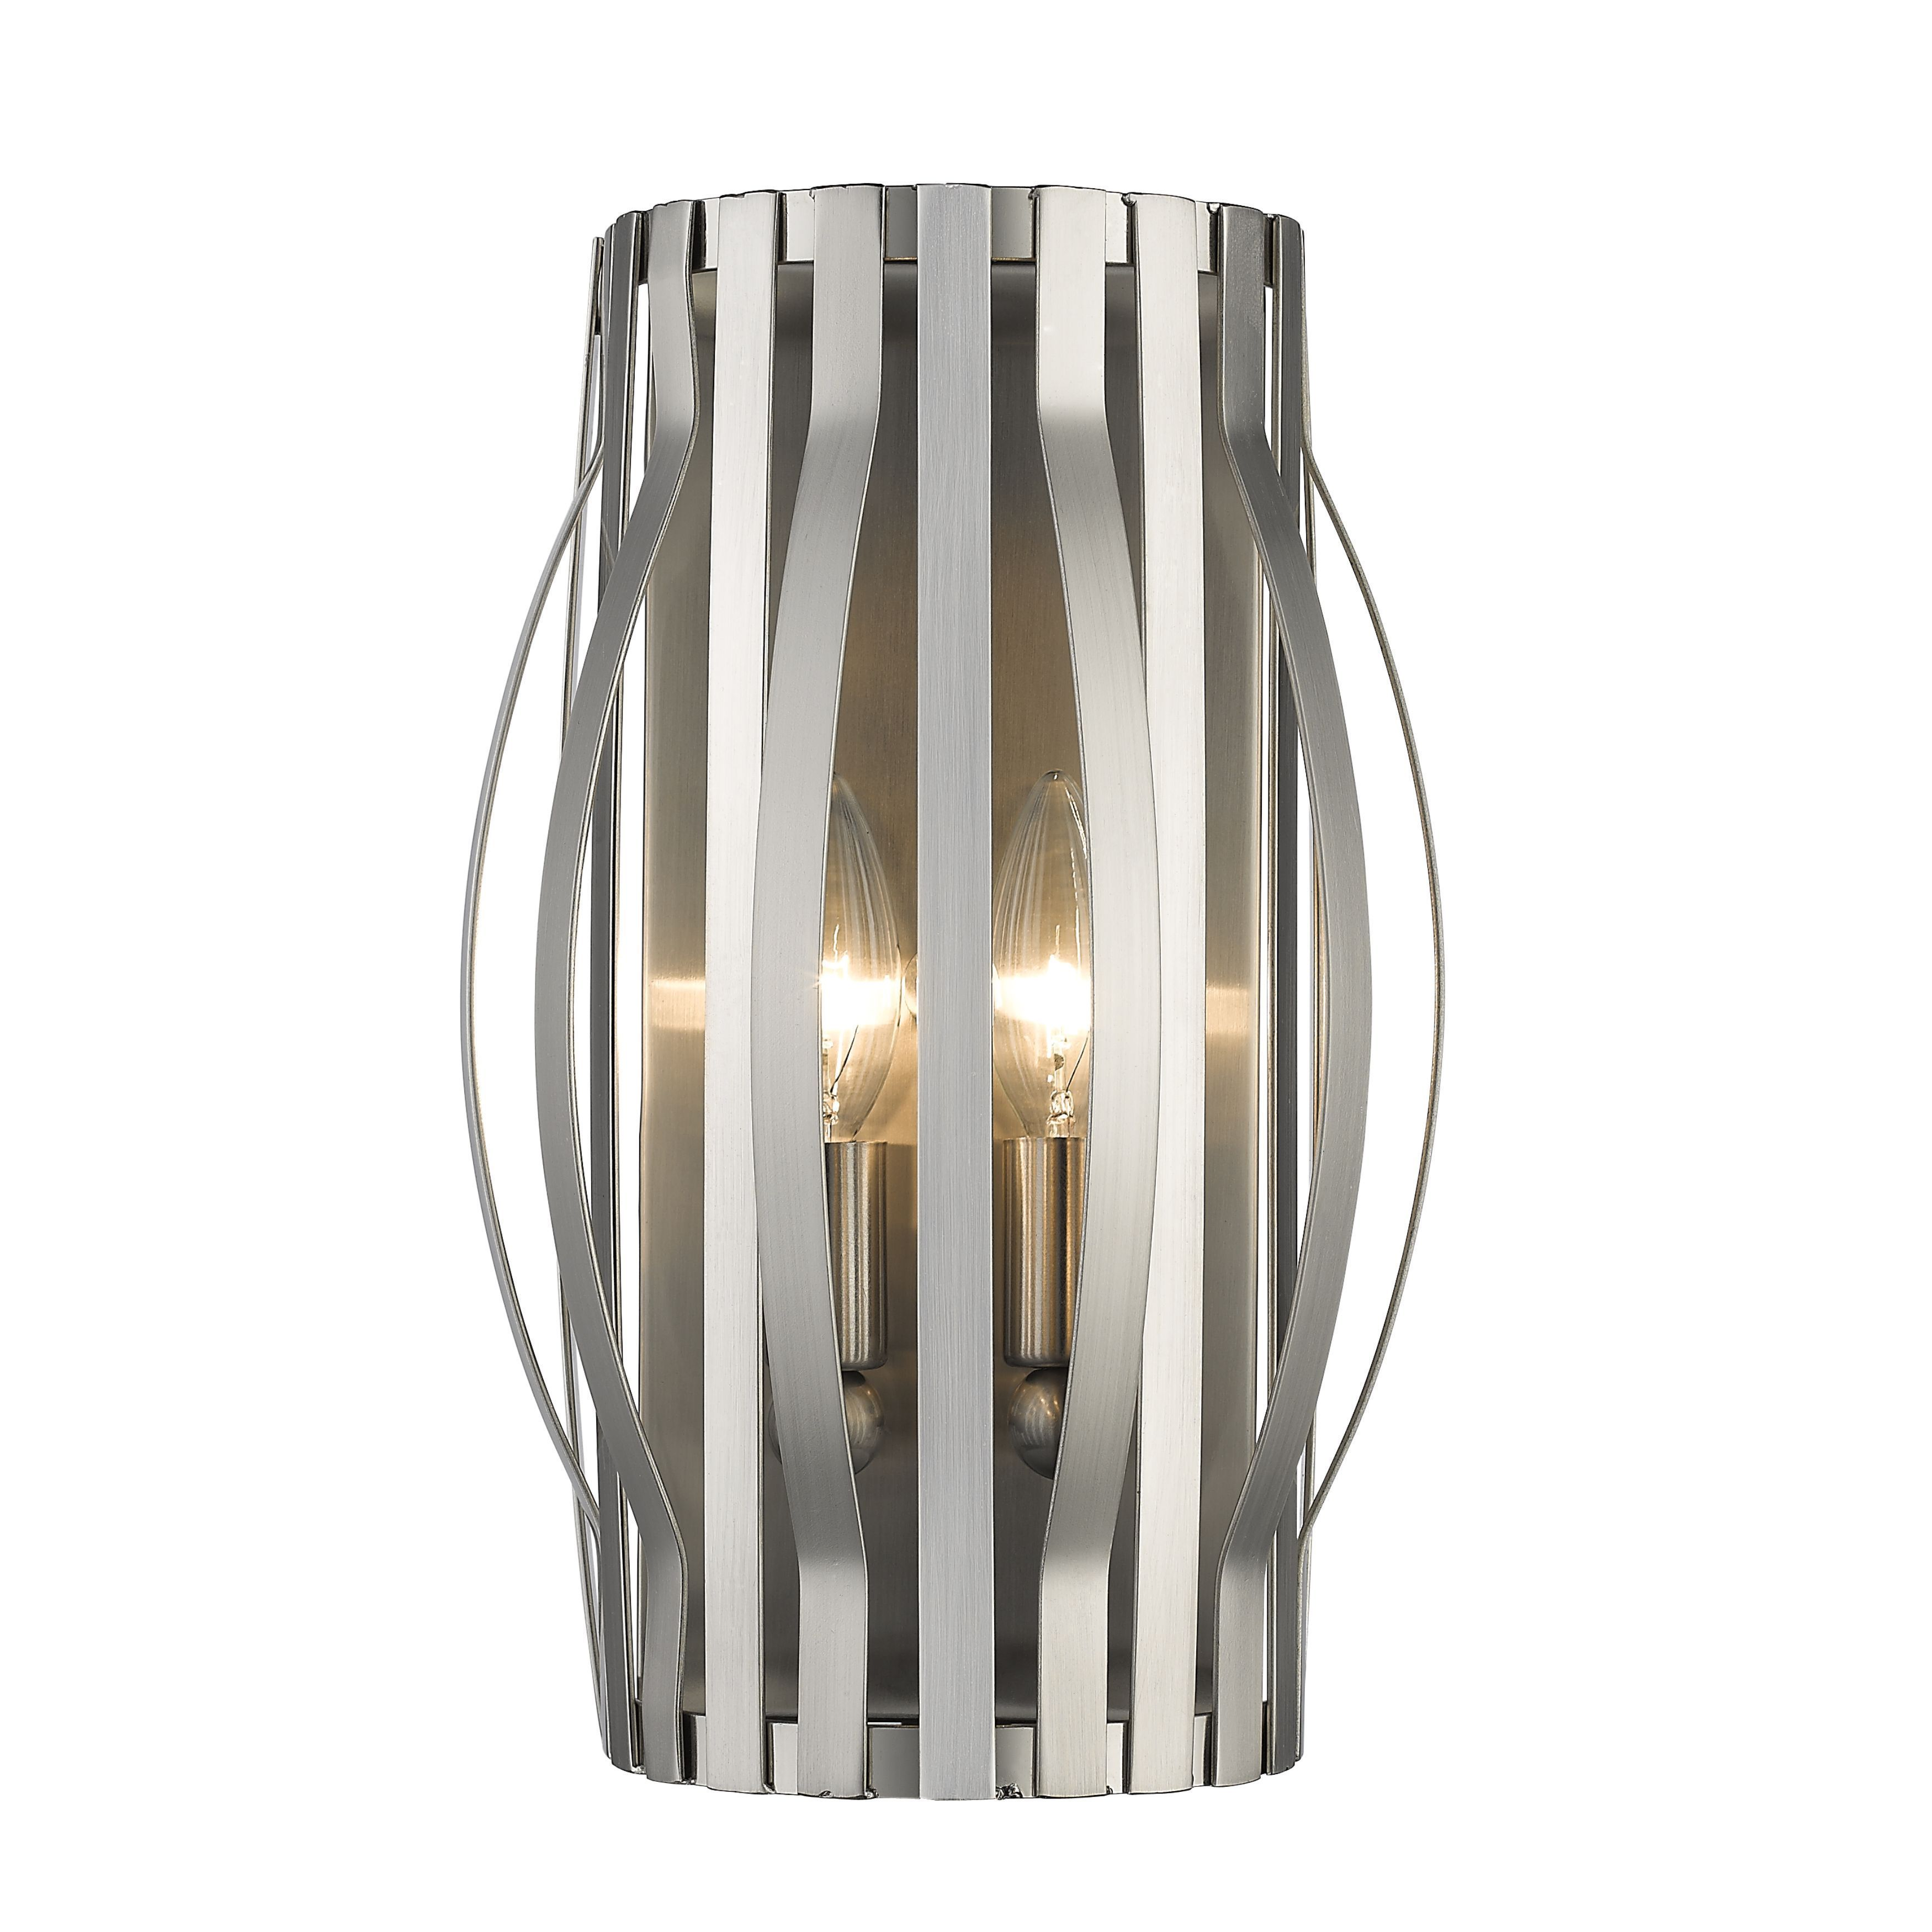 Z-Lite Moundou 2-light Wall Sconce in Brushed Nickel (Light), Silver (Metal)